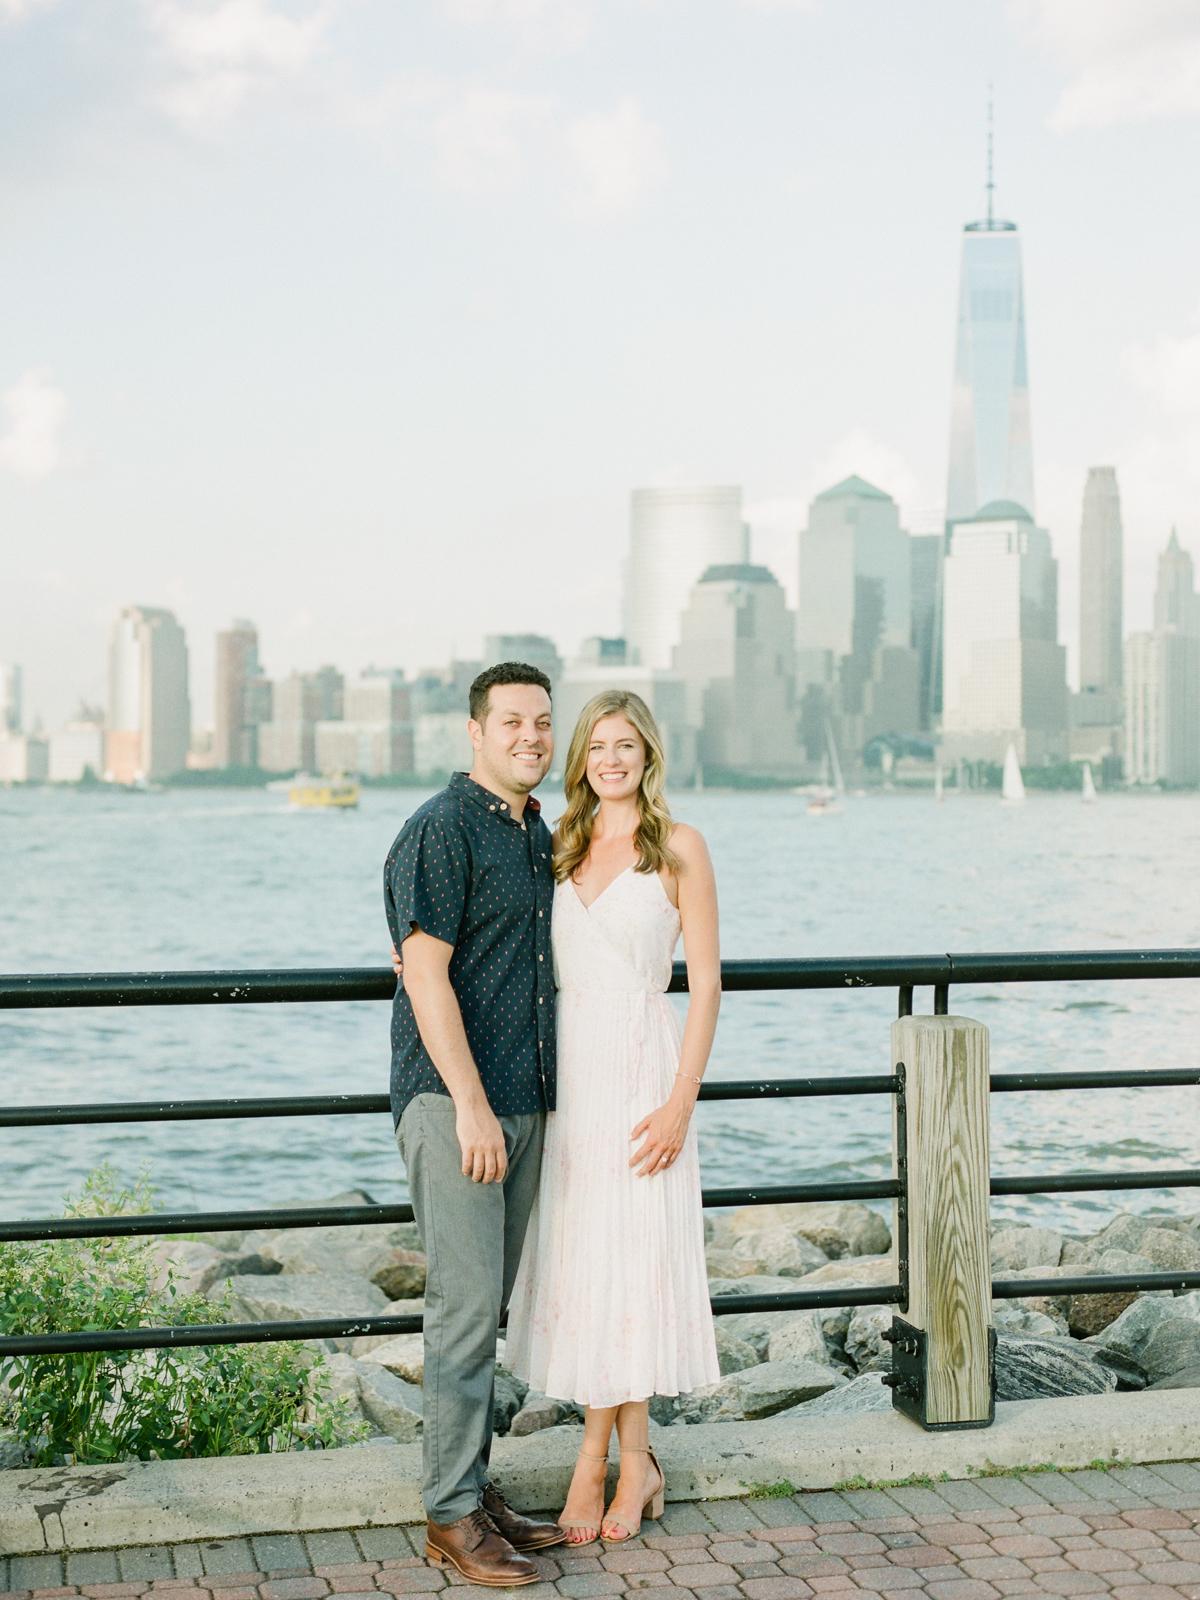 NYC-skyline-engagement-session-by-Tanya Isaeva-14.jpg